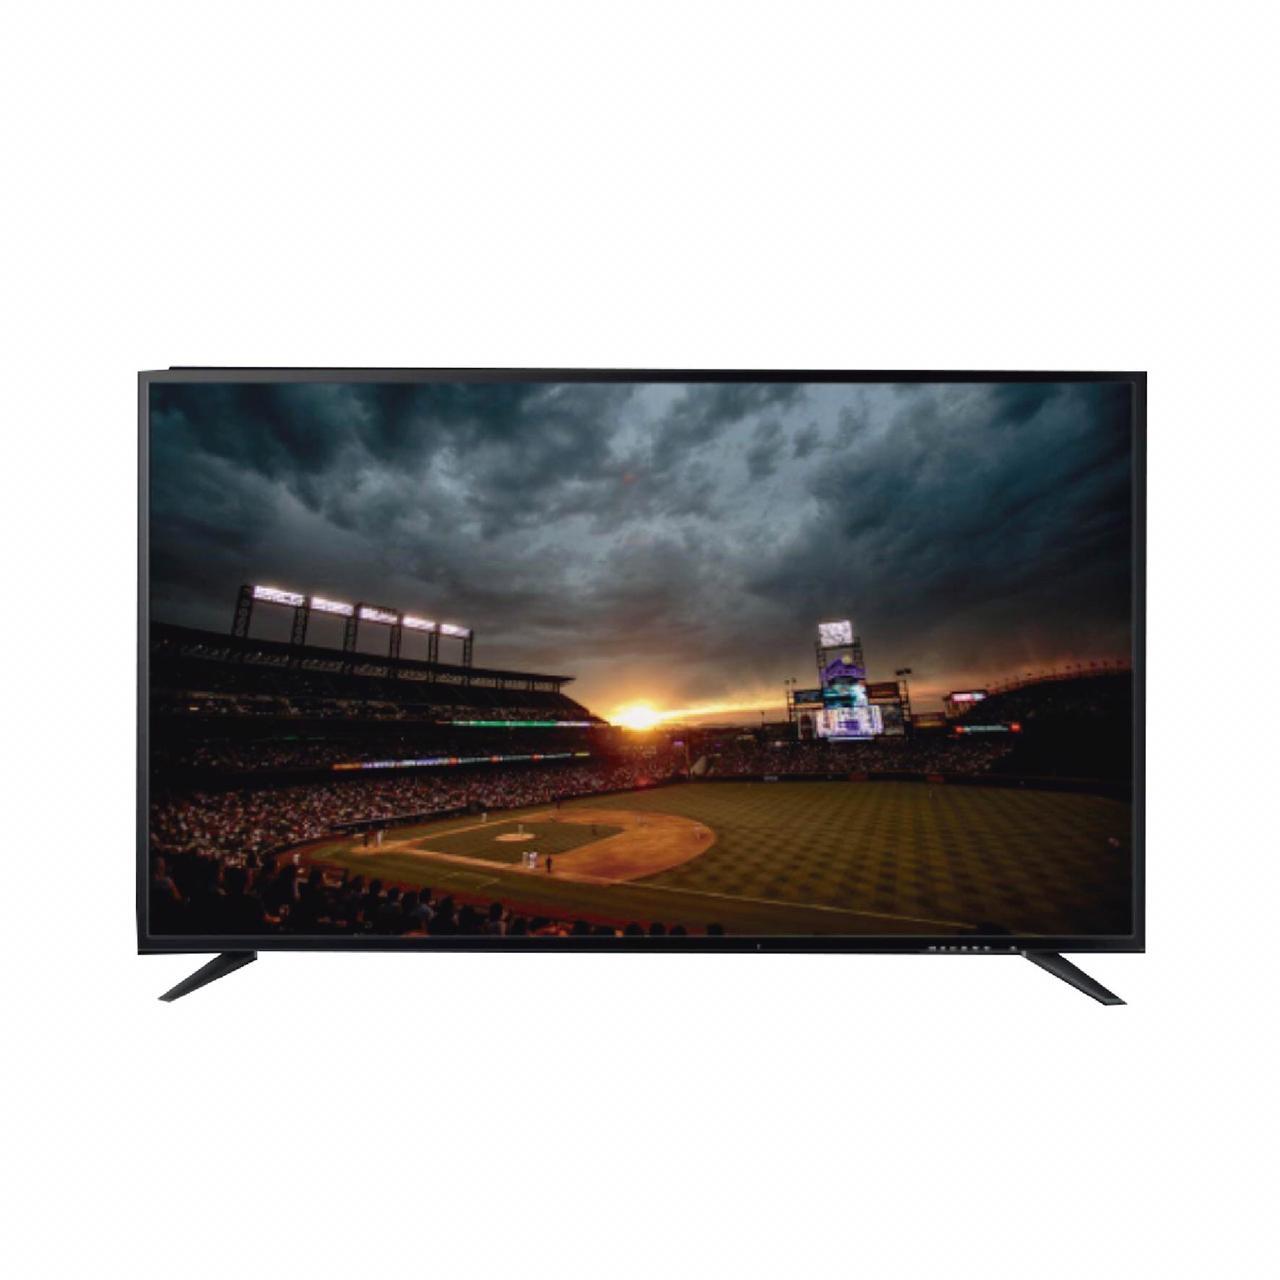 Televisor Danilux 32¨ Smart TV